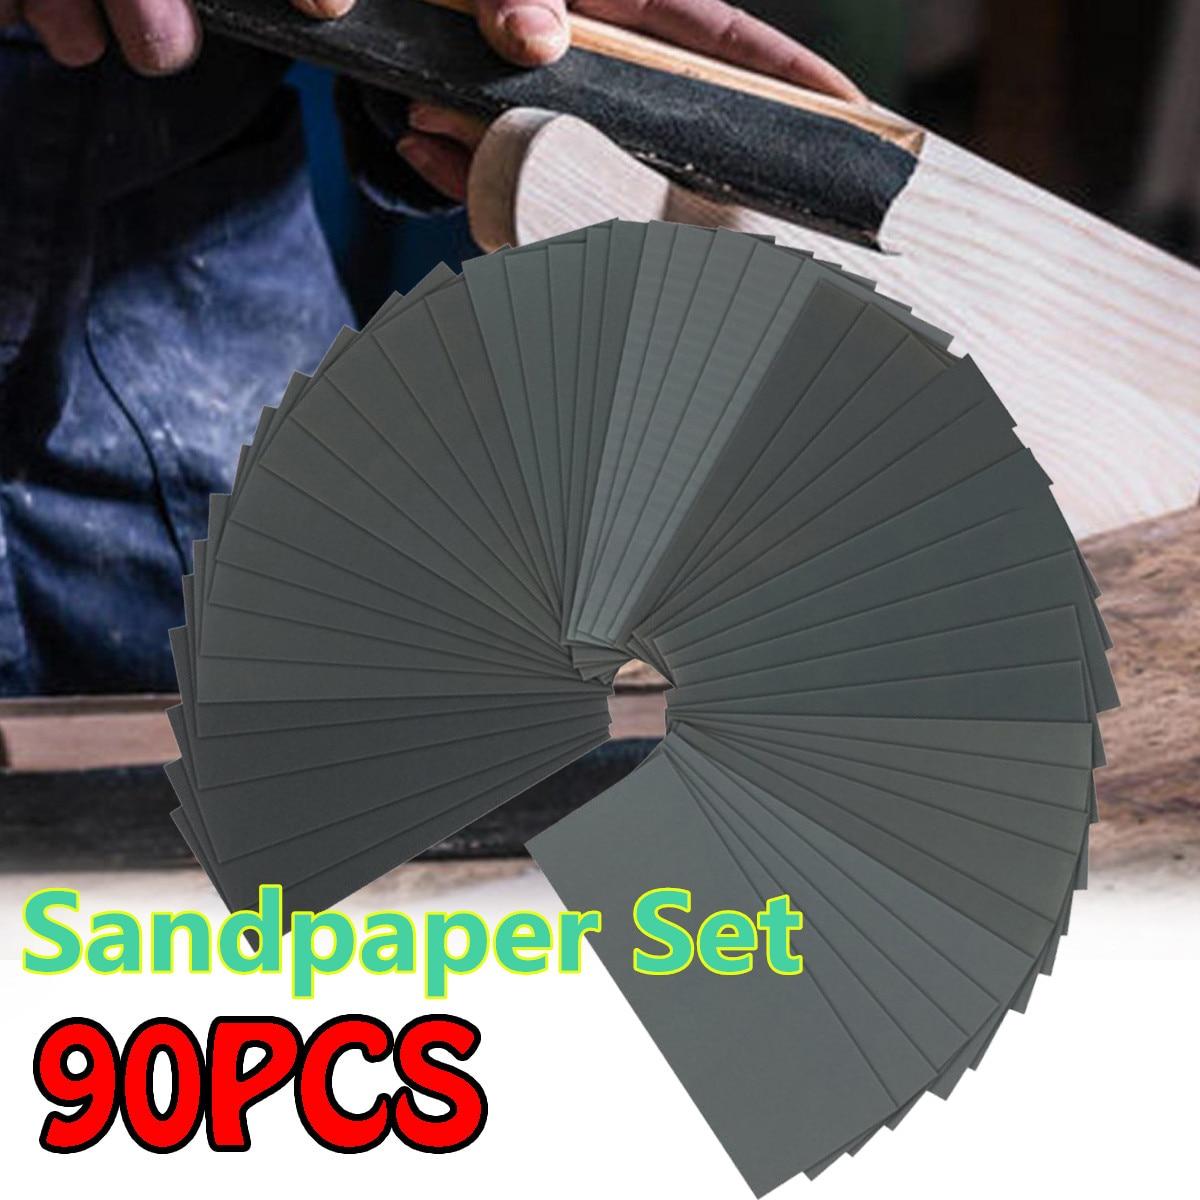 36/42/90Pcs Wet Dry Sandpaper Set 120-5000 Grit Polishing Abrasive Waterproof Paper Sheets For Automotive Sanding Wood Furniture